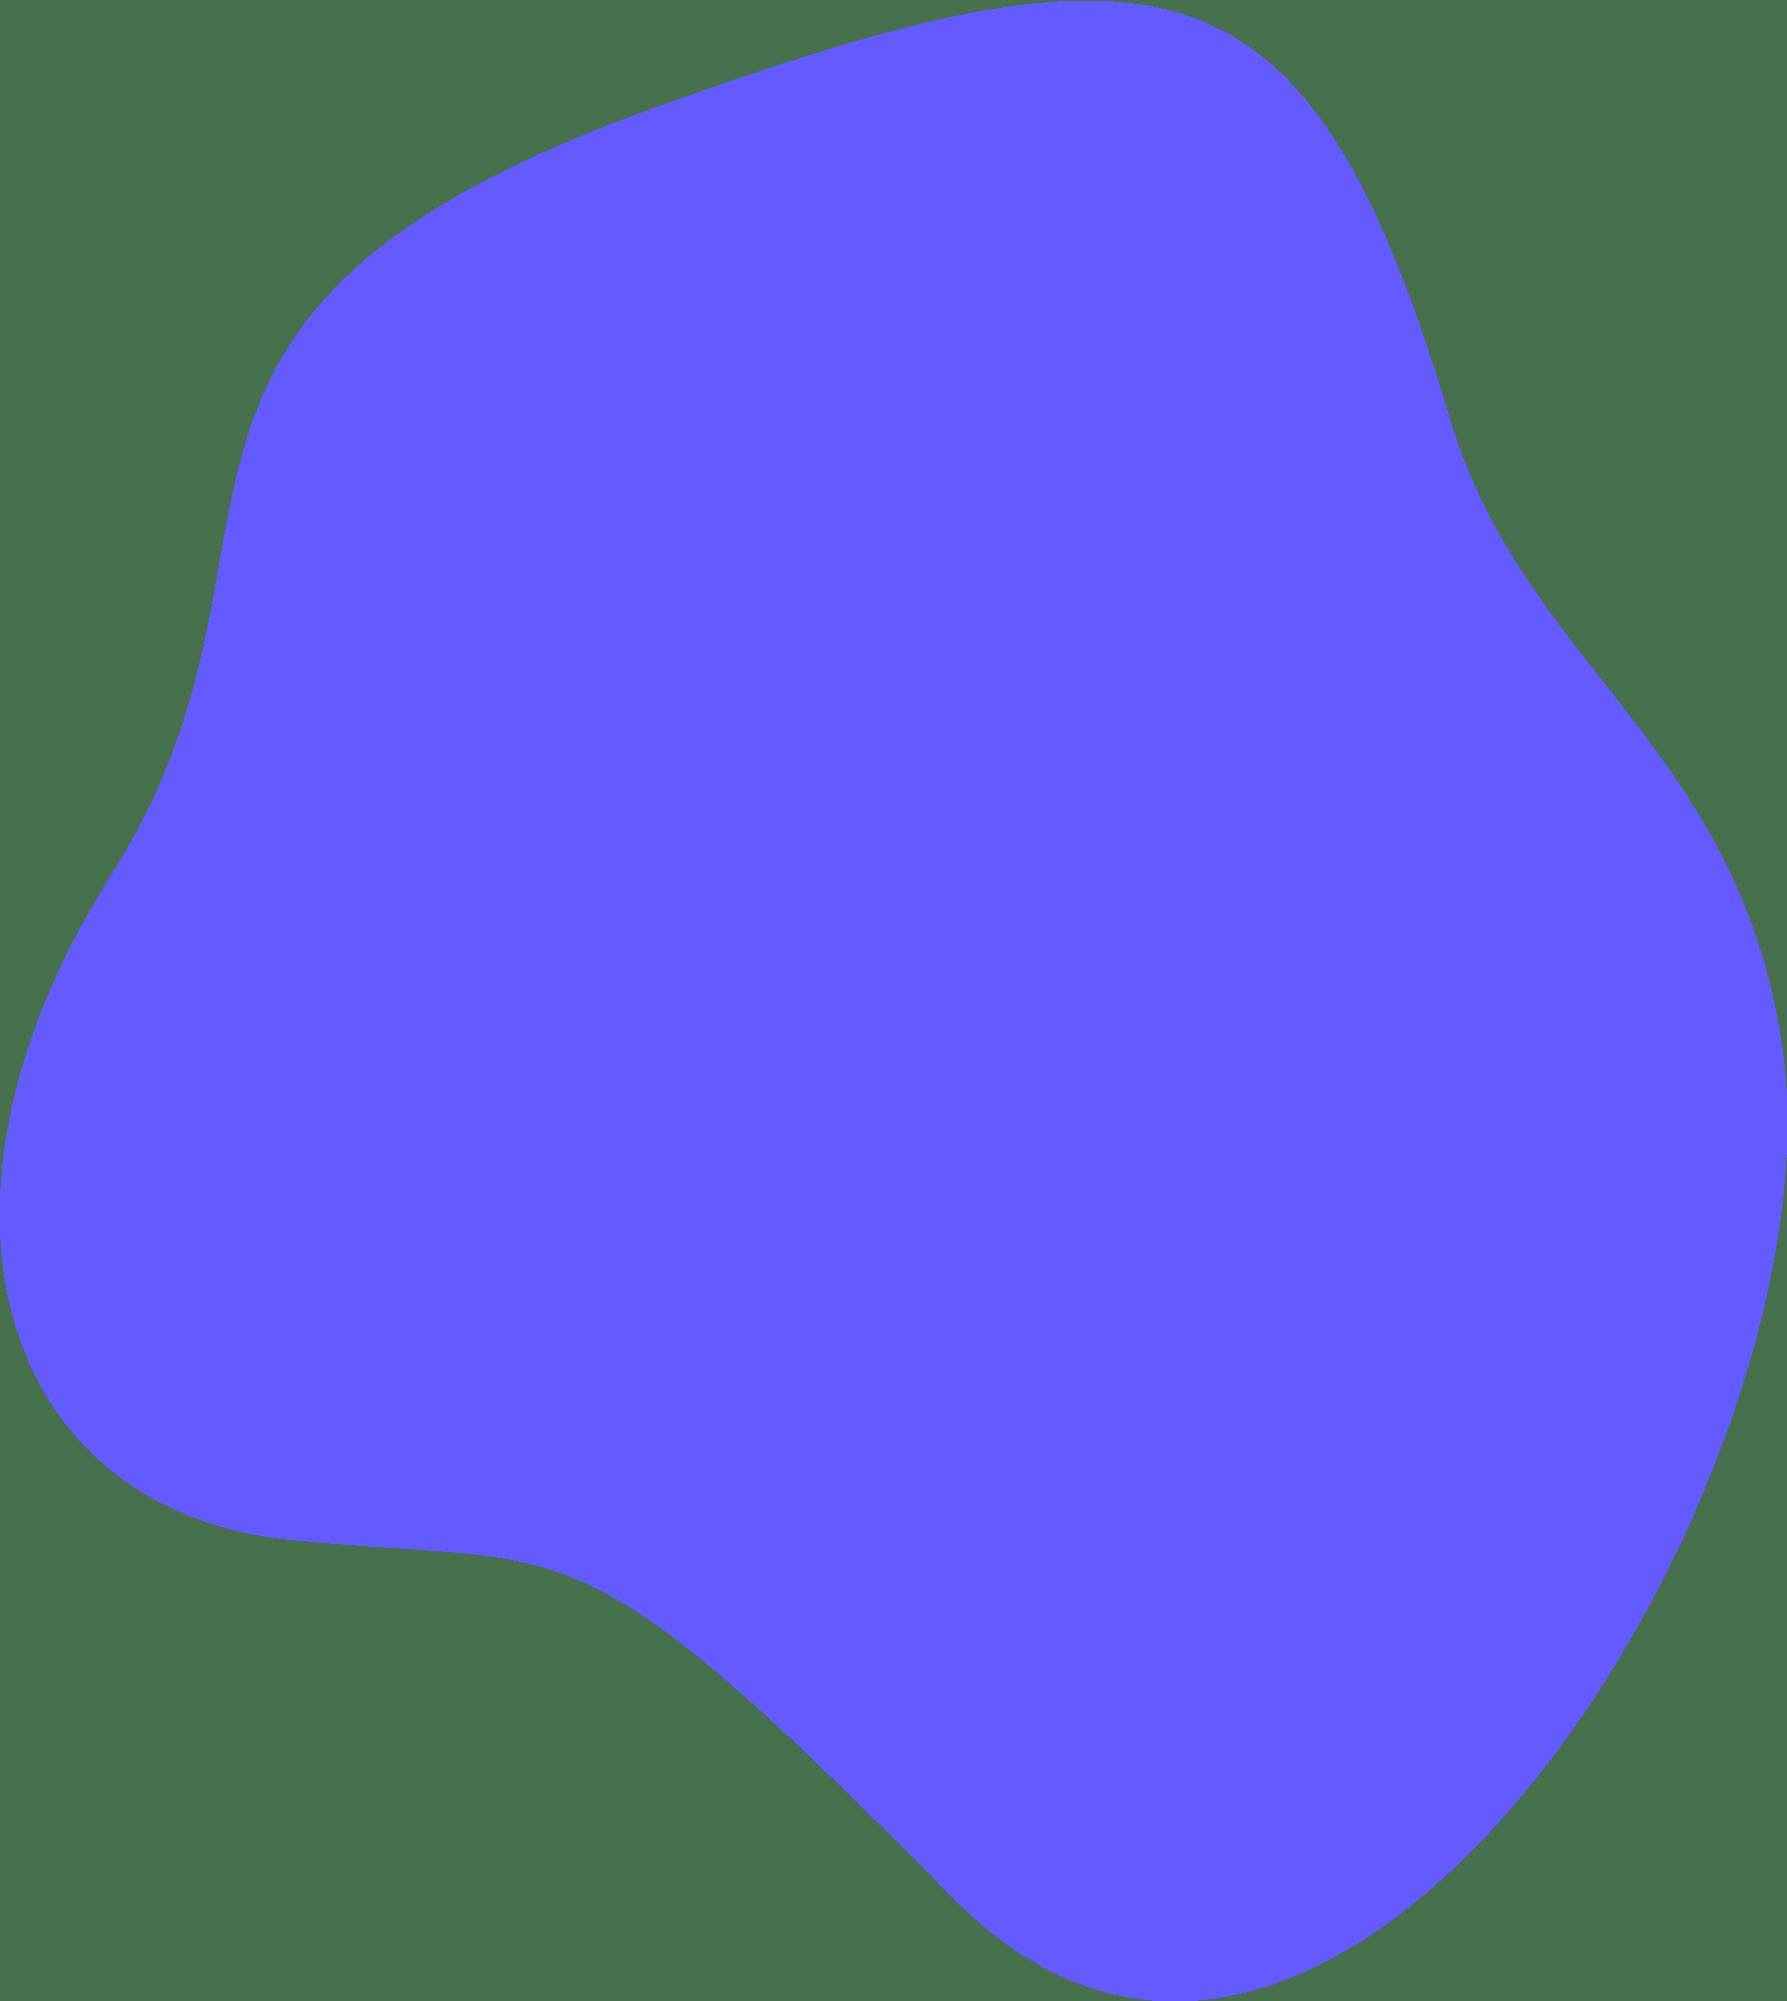 Achtergrond vorm sectie communicatie